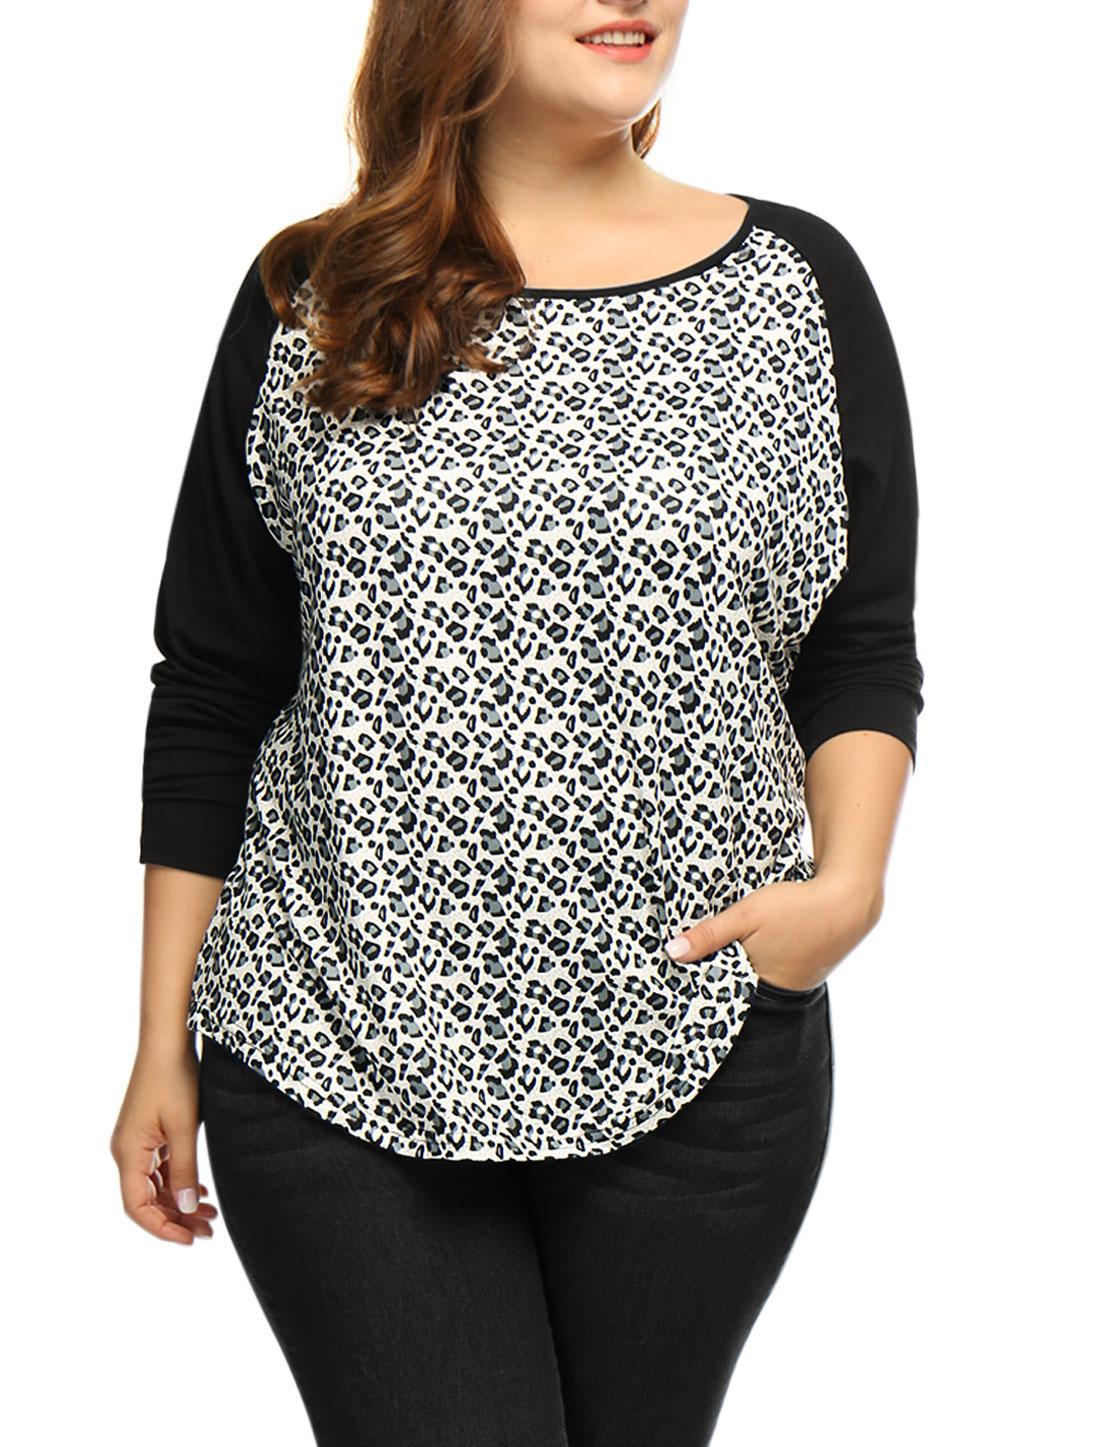 Women Plus Size Scoop Neck Leopard Print Raglan T-Shirt Black 3X